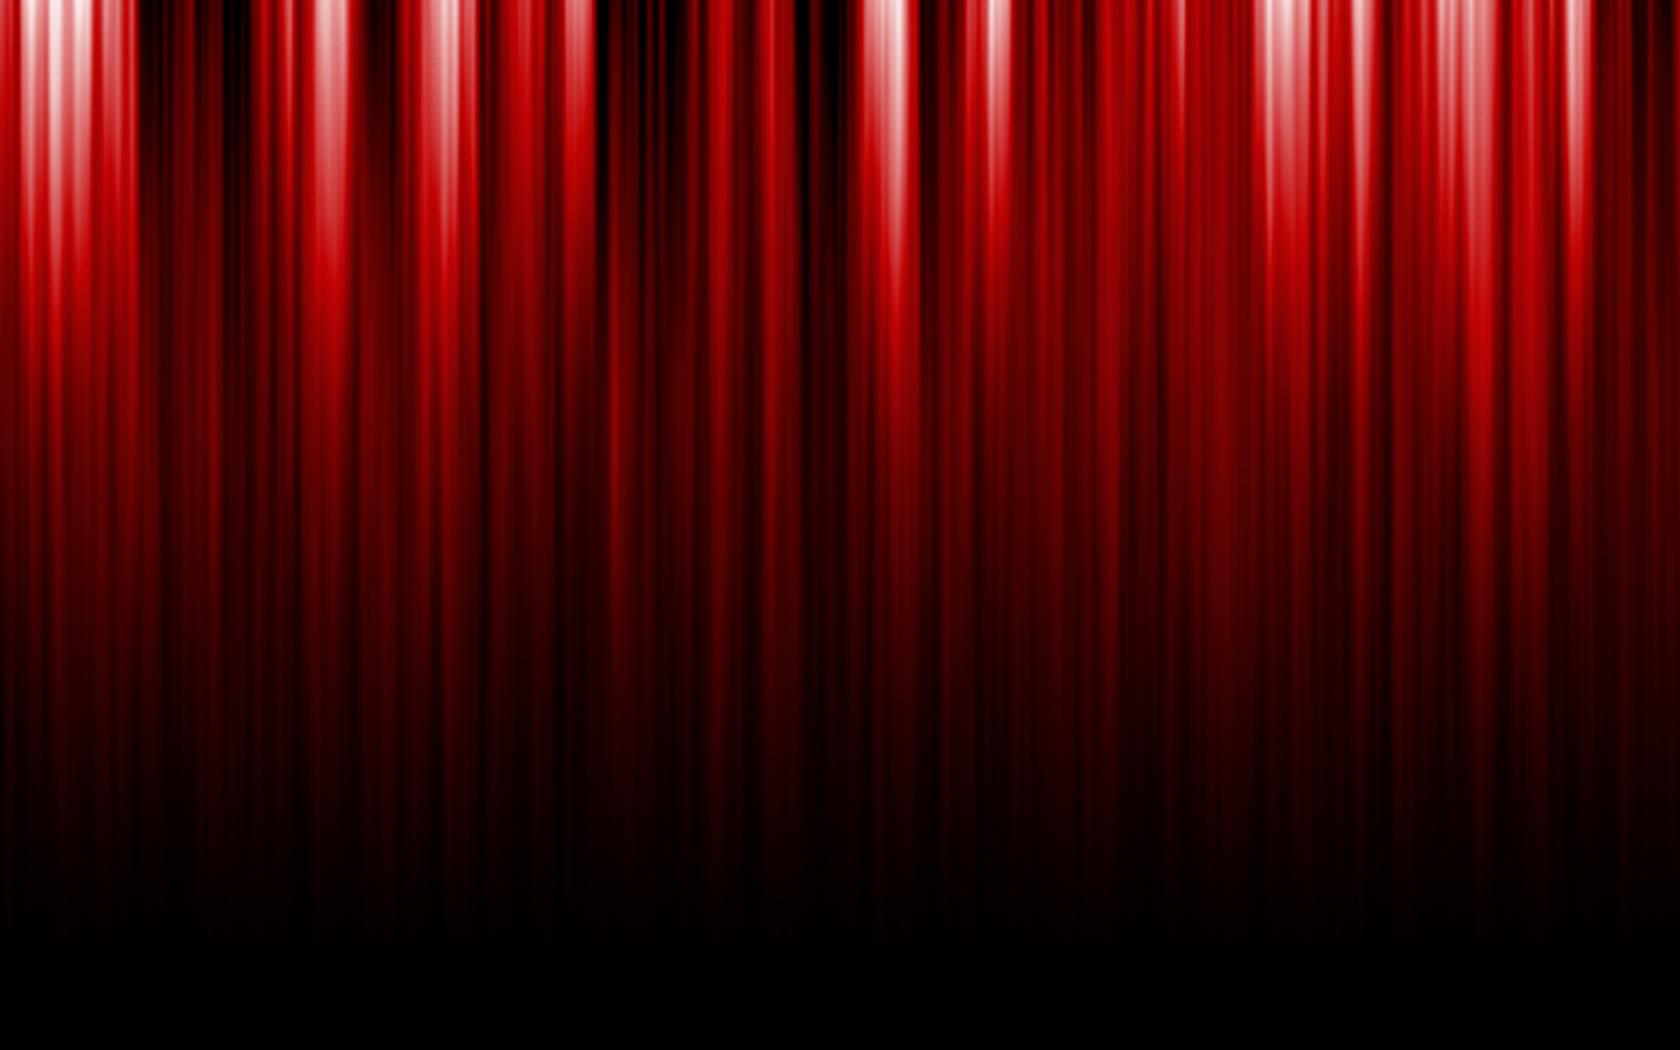 ... closed curtains 673 x 680 102 kb jpeg closed curtains 1220 x 920 860